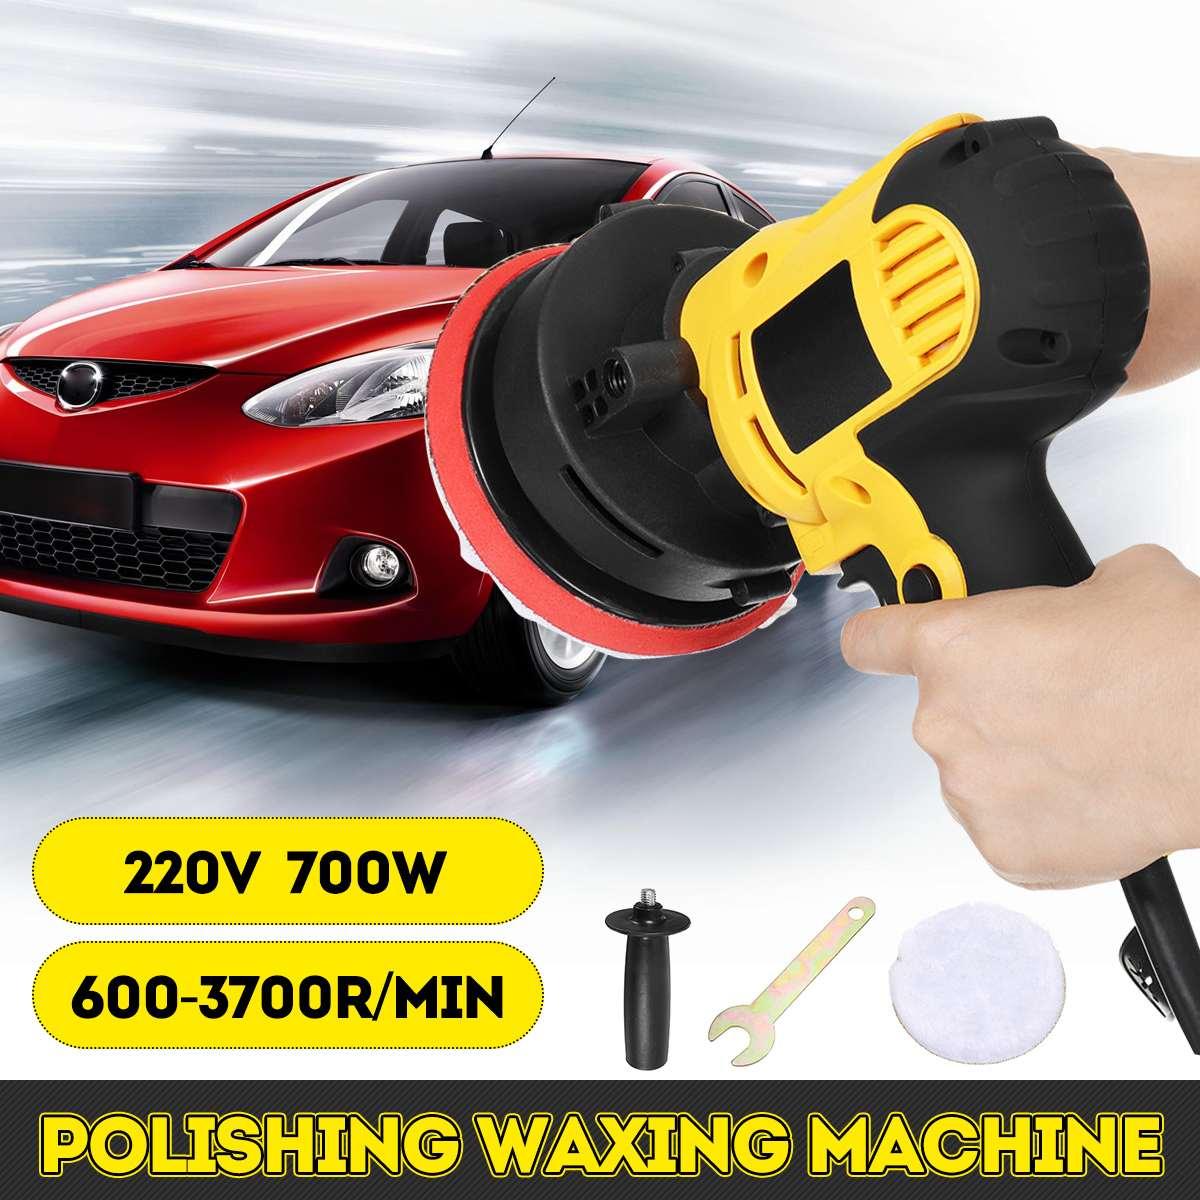 700W 600-3700rpm Electric Car Polisher Machine 220V Auto Polishing Machine 6 Speed Sander Polish Waxing Tools Car Accessories